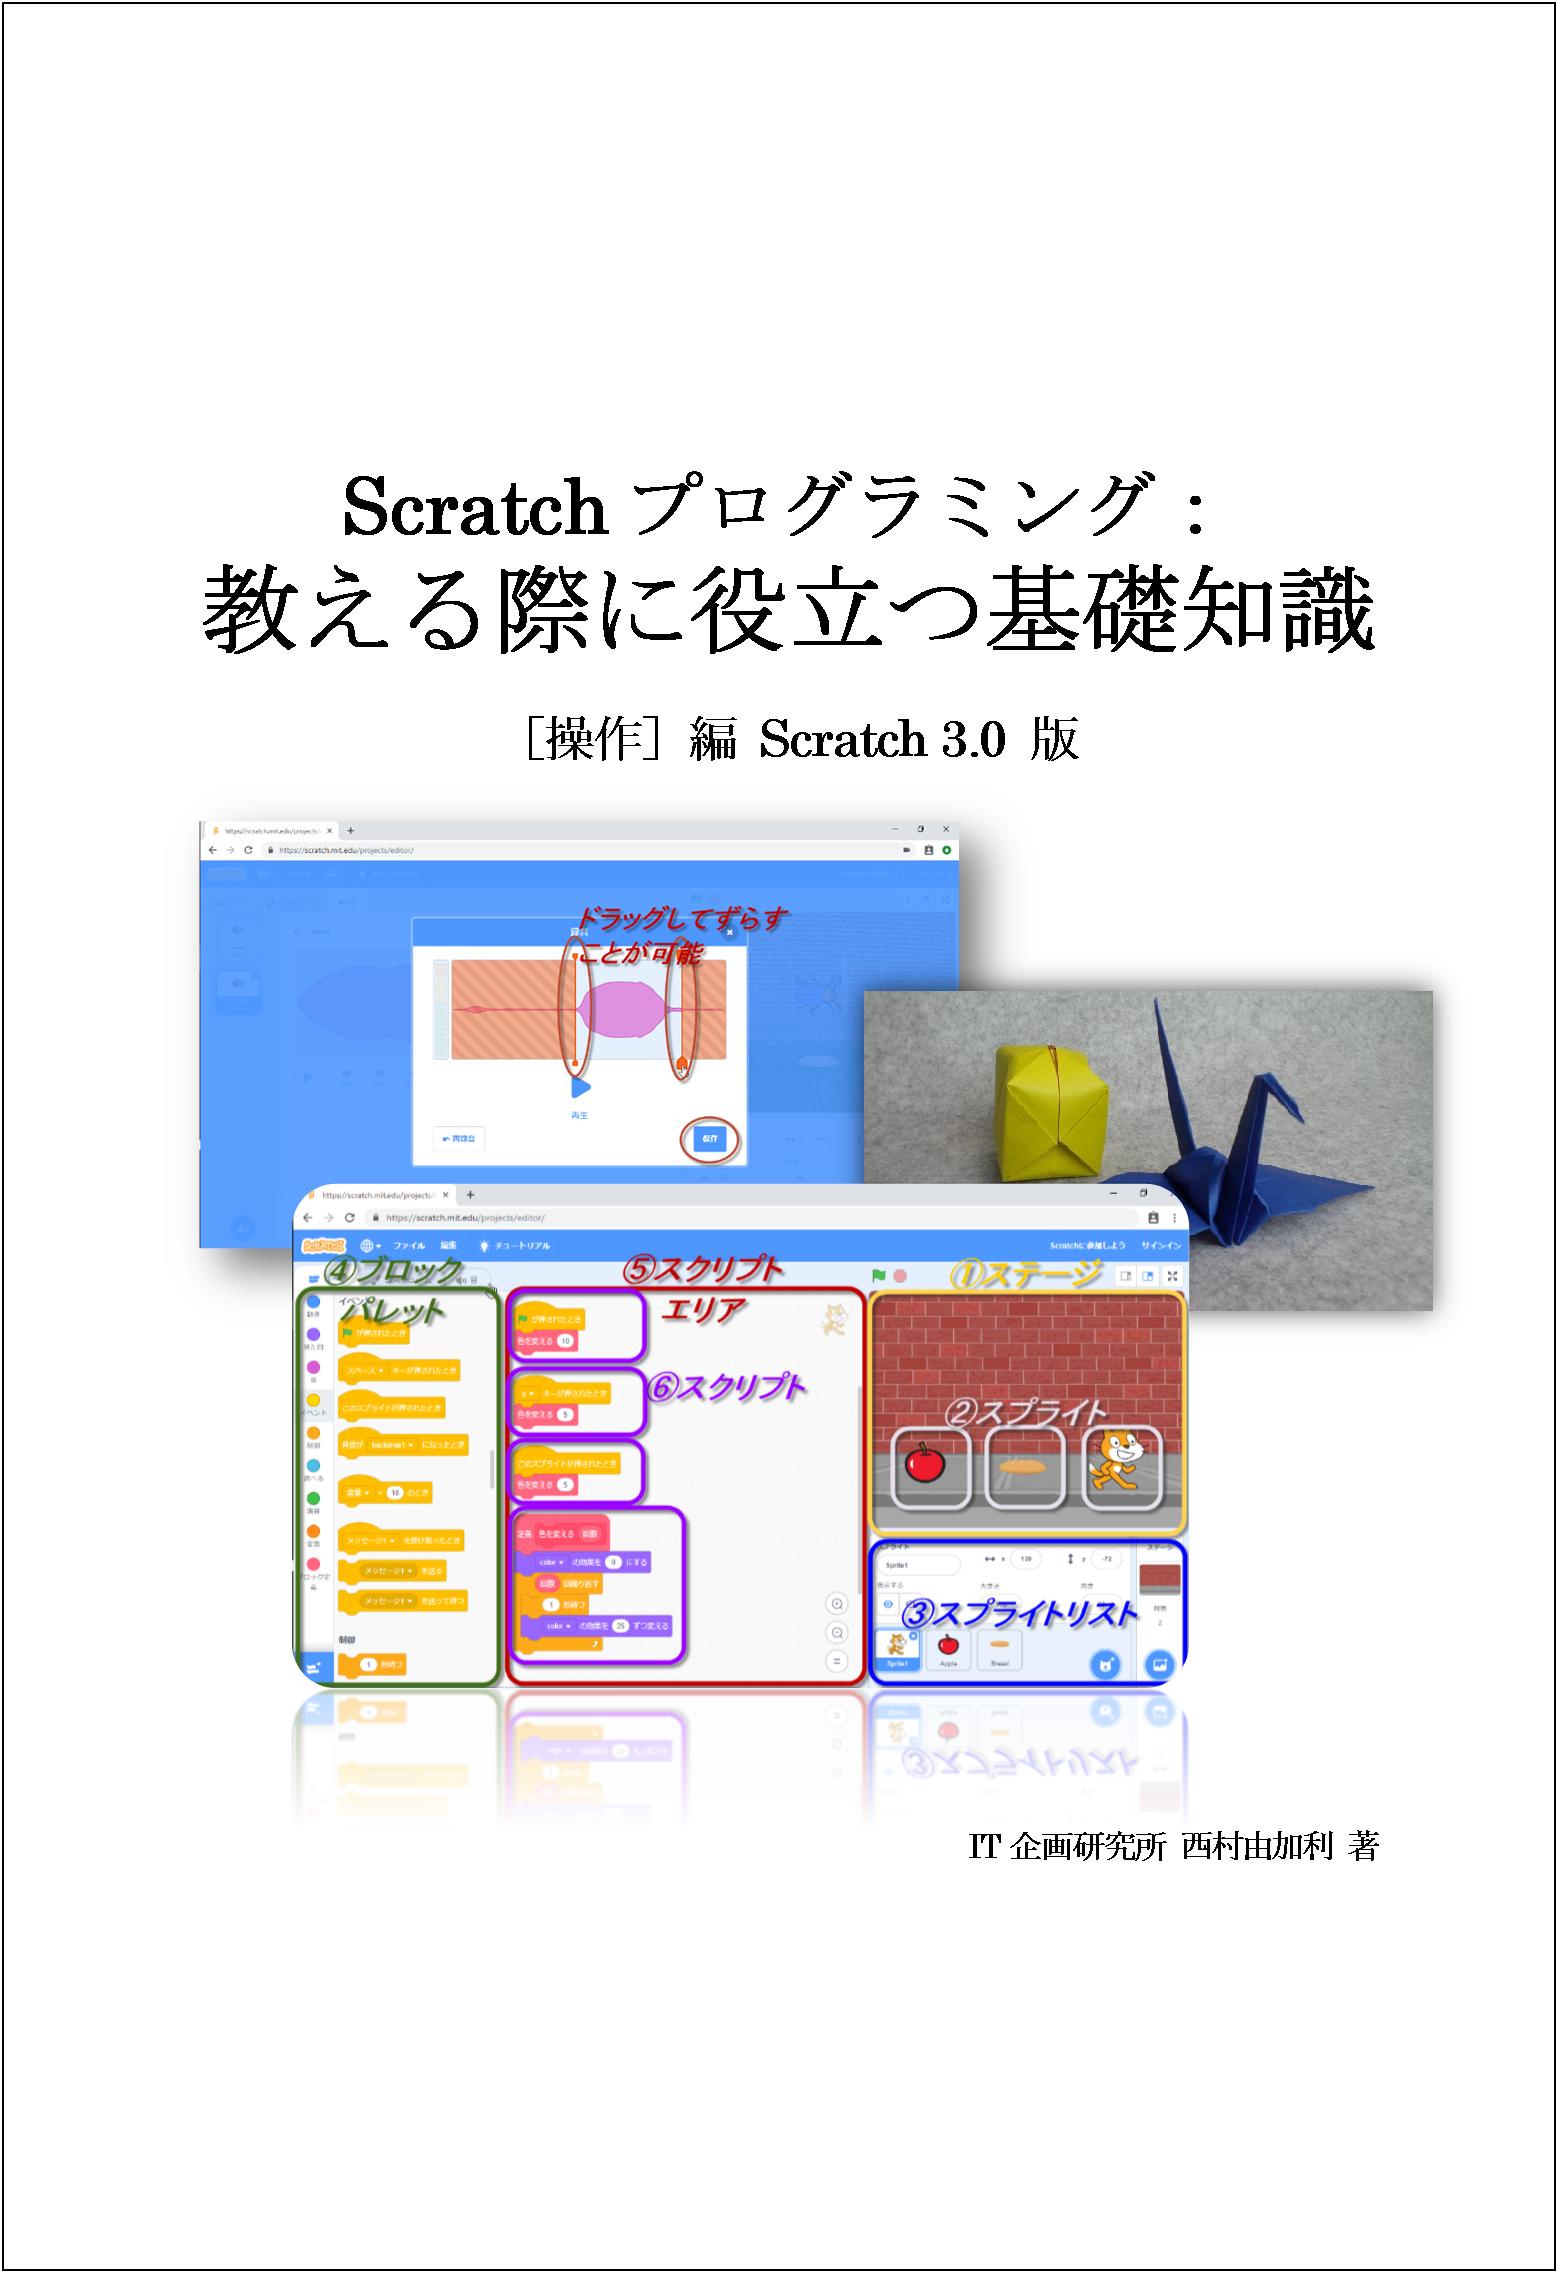 Scratchプログラミング:教える際に役立つ基礎知識